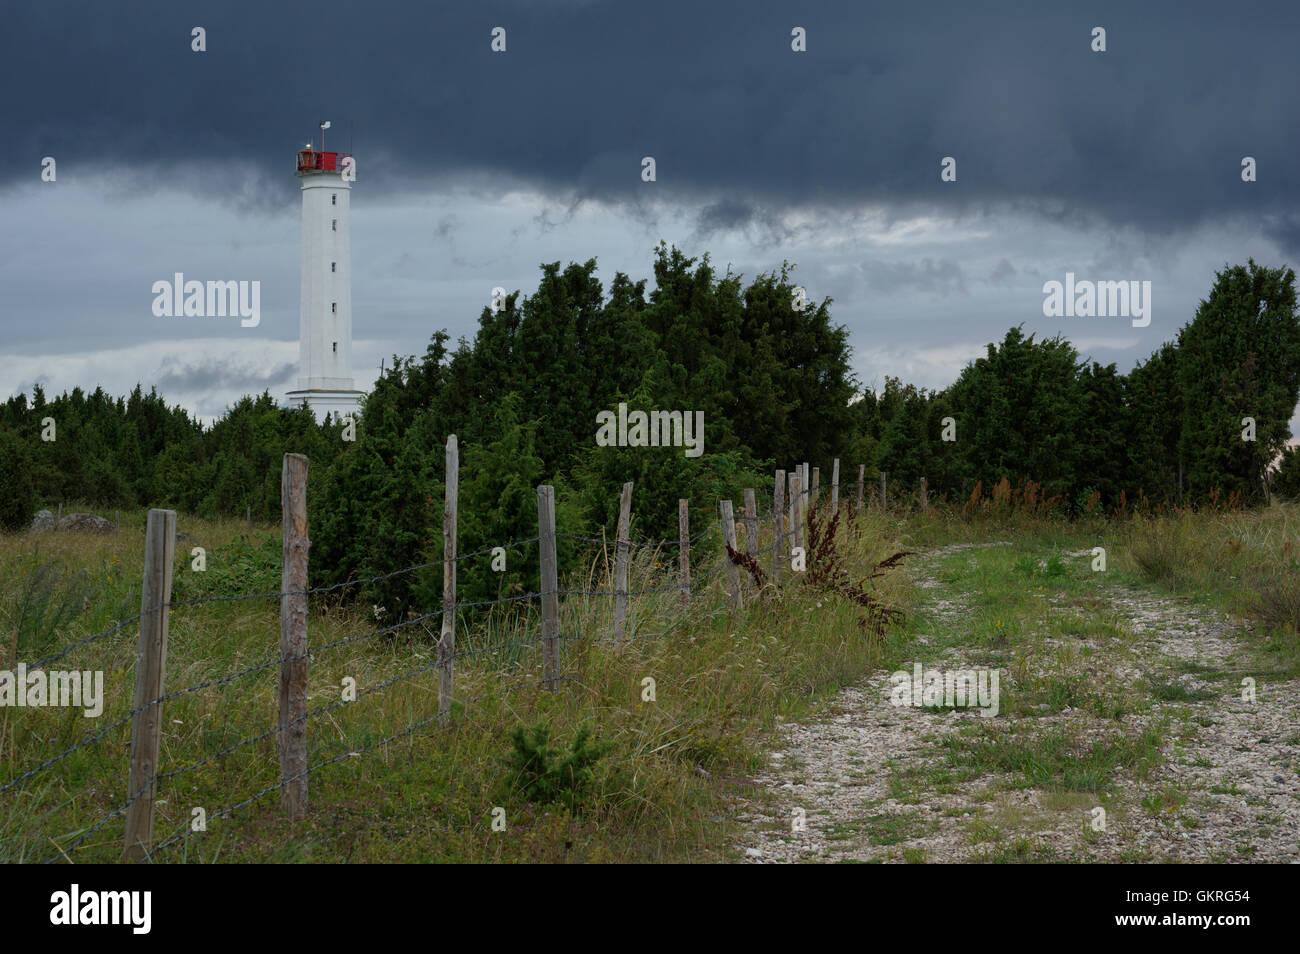 Sõmeri Lighthouse, Sõmeri Peninsula Light cordinates: 58.3503 N; 23.7398 E Pärnu County Estonia 10th - Stock Image